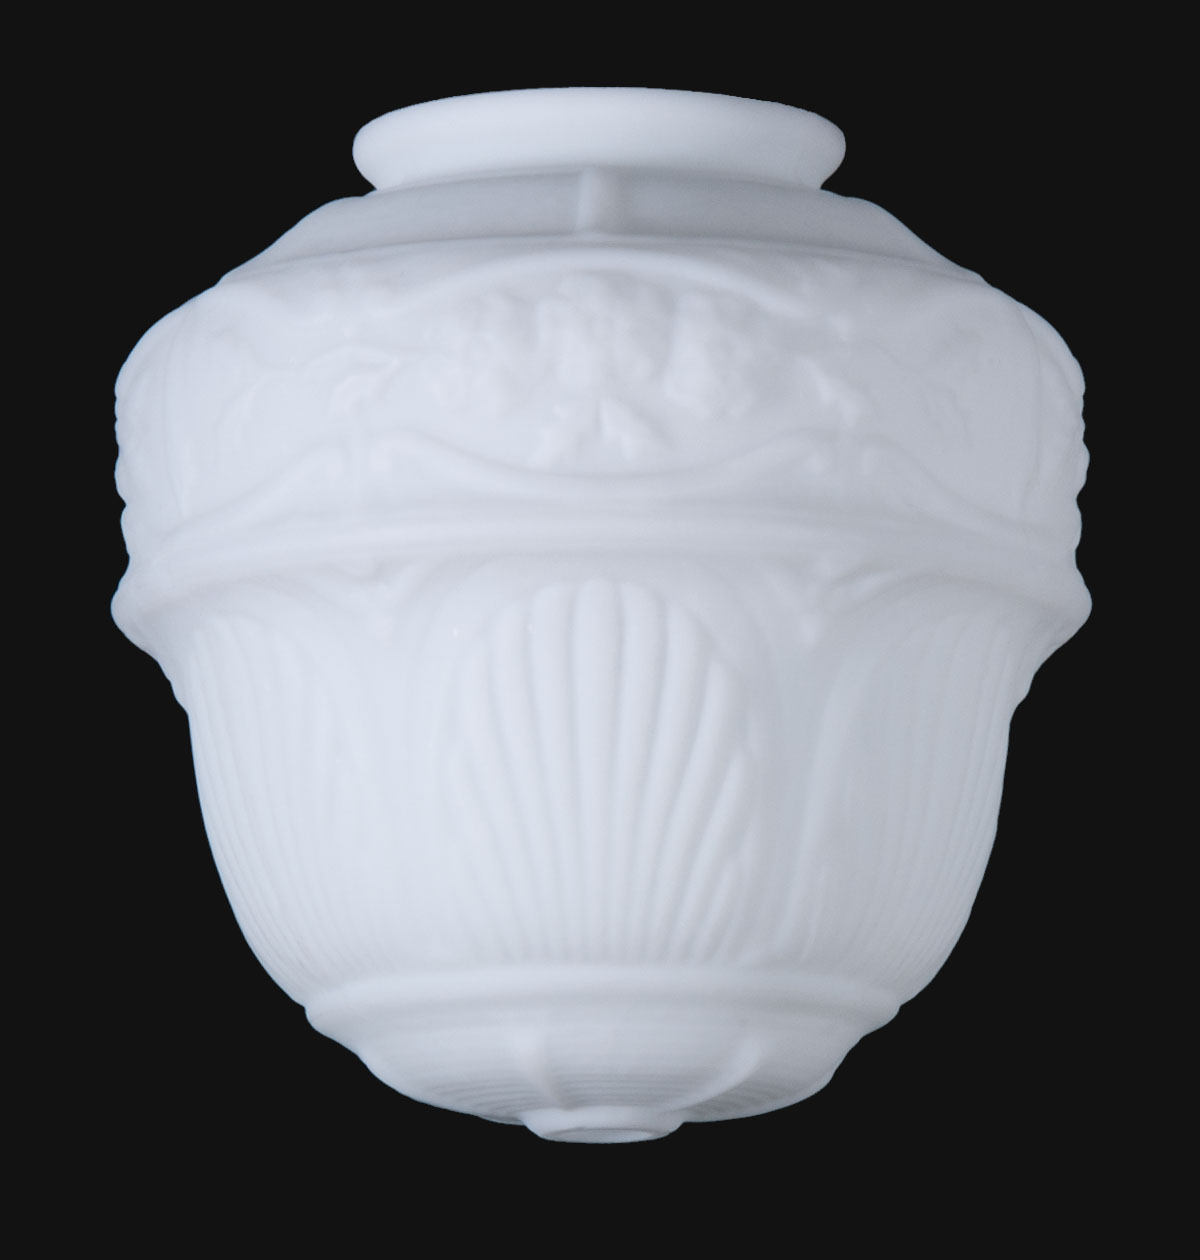 Opal Glass Embossed Hall Light Shade 08822 B Amp P Lamp Supply